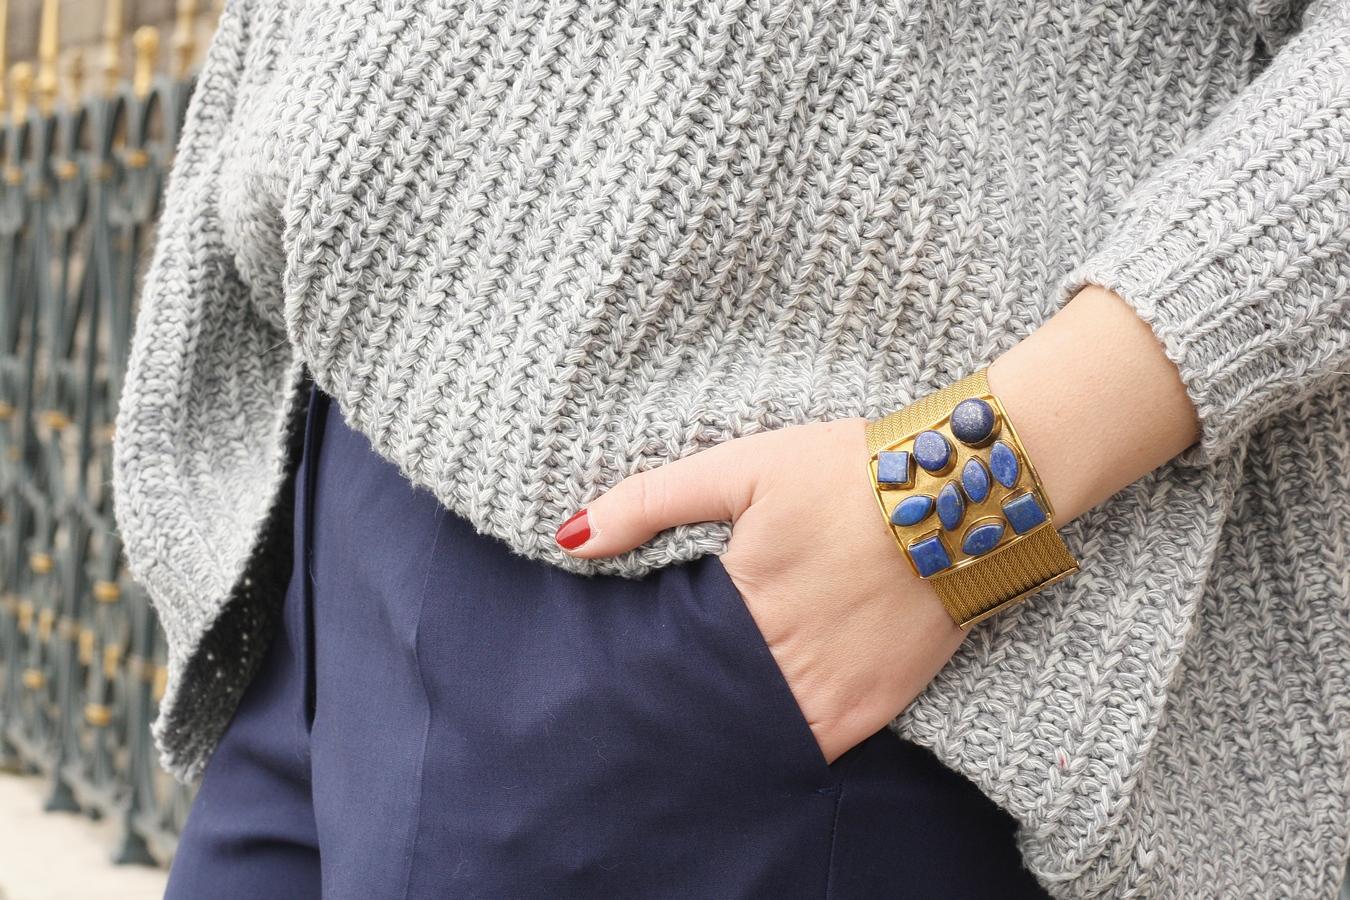 Blog mode femme Paris - Du style, Madame - Streetstyle - manchette bijoux OGGI